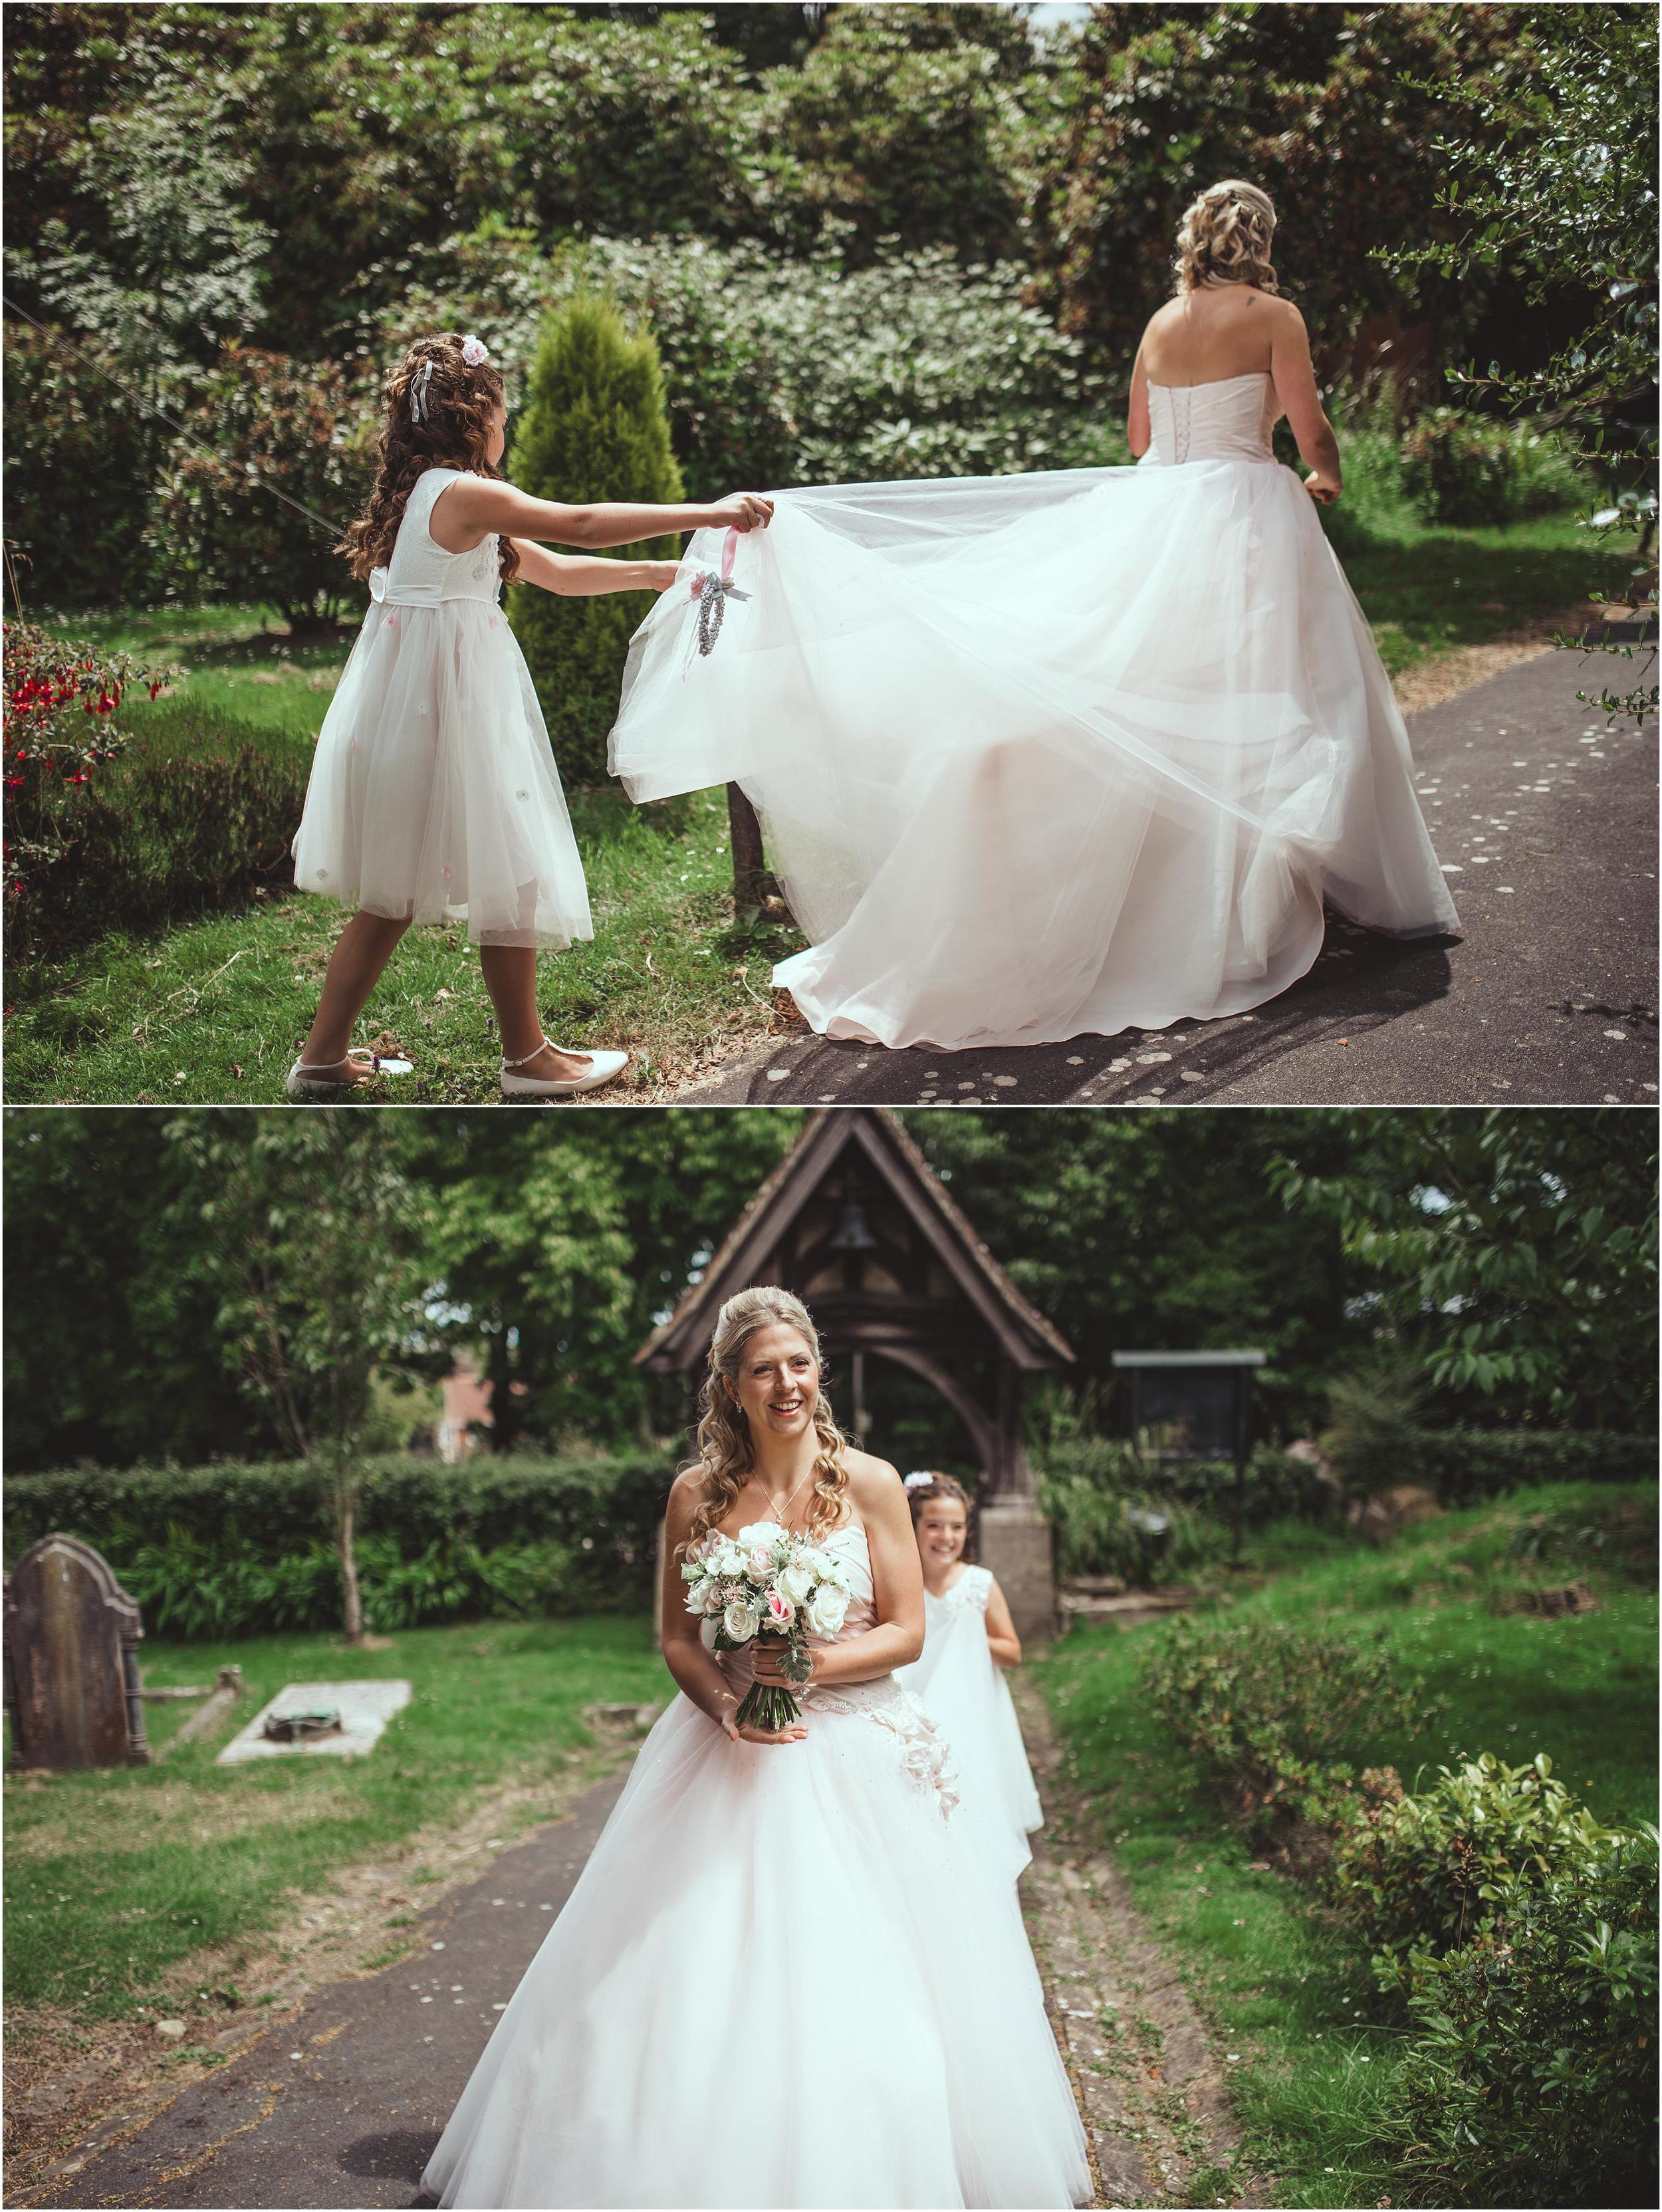 Appuldurcombe house wedding_0032.jpg